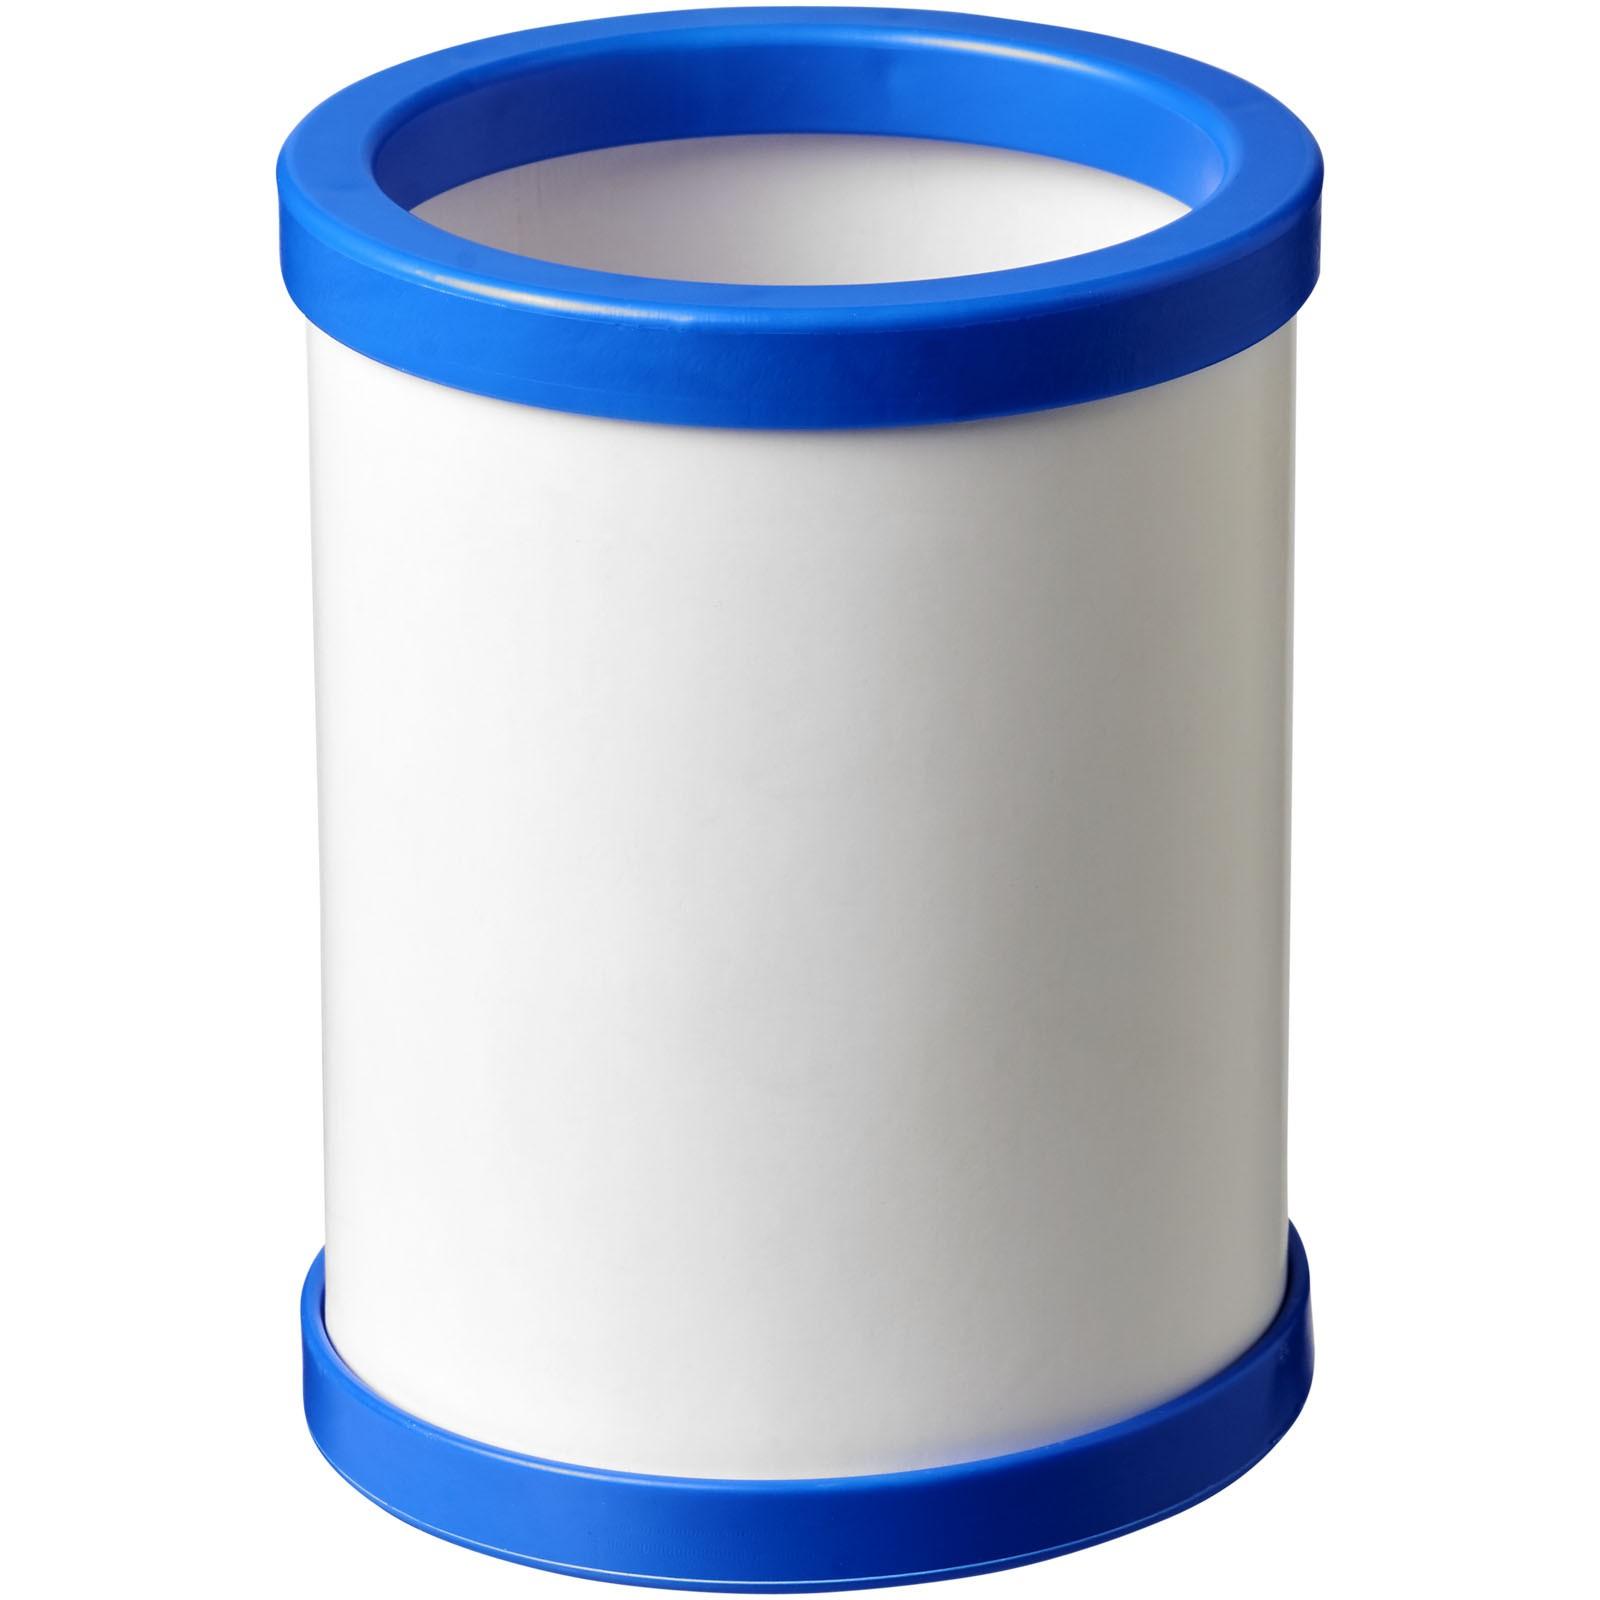 Deva round card pen holder with plastic trim - Blue